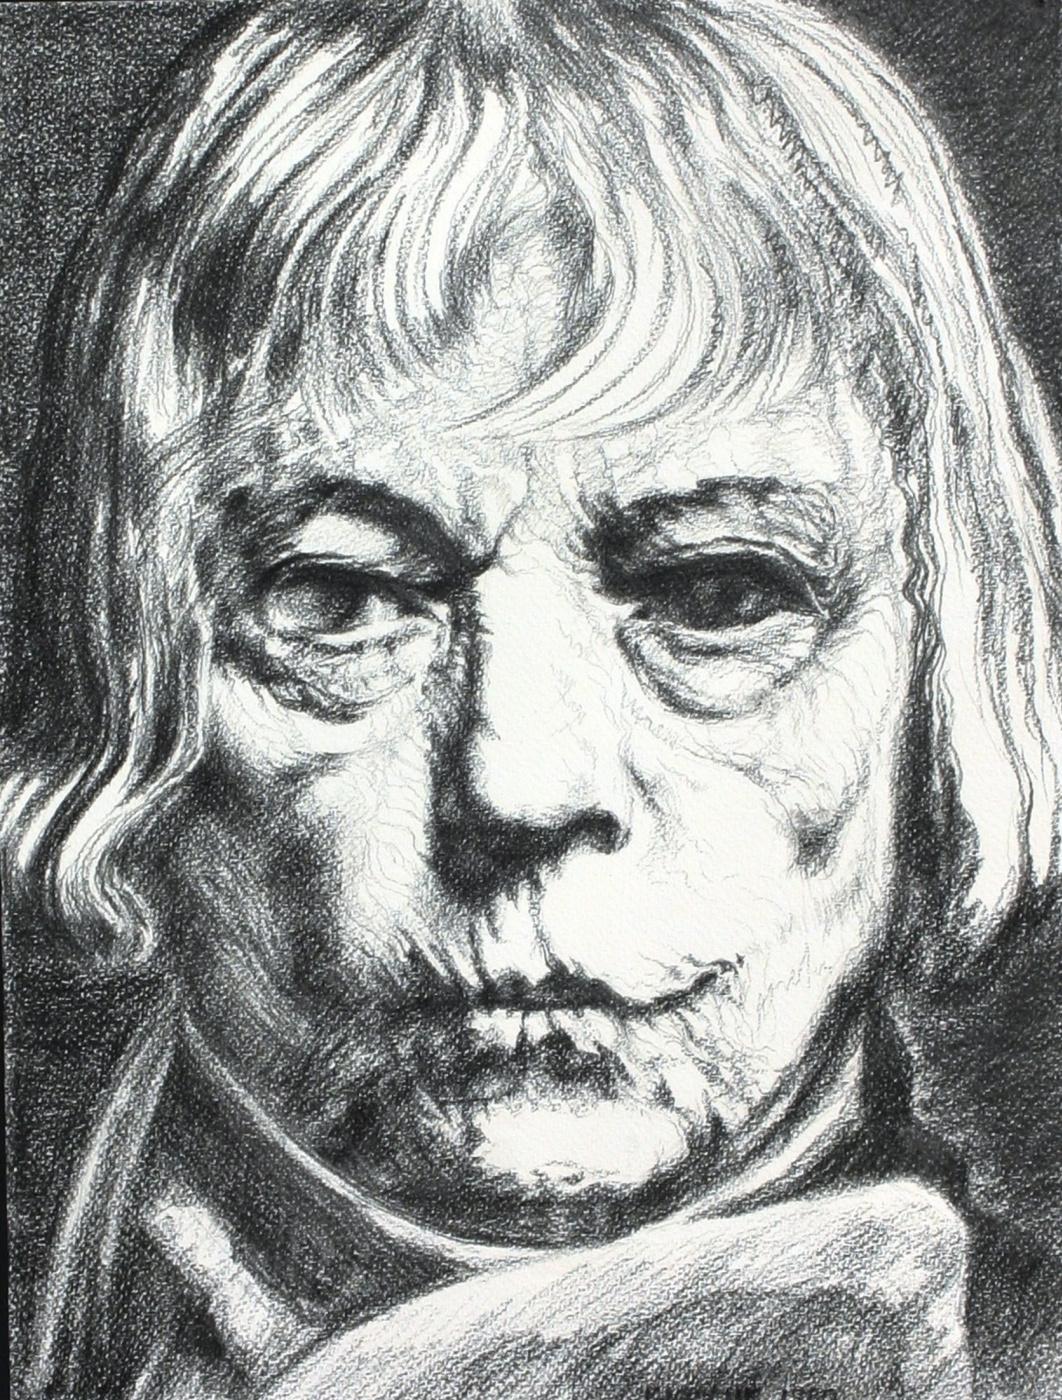 Alexander Ocher Kandinsky-DAE. Old woman with a thorn